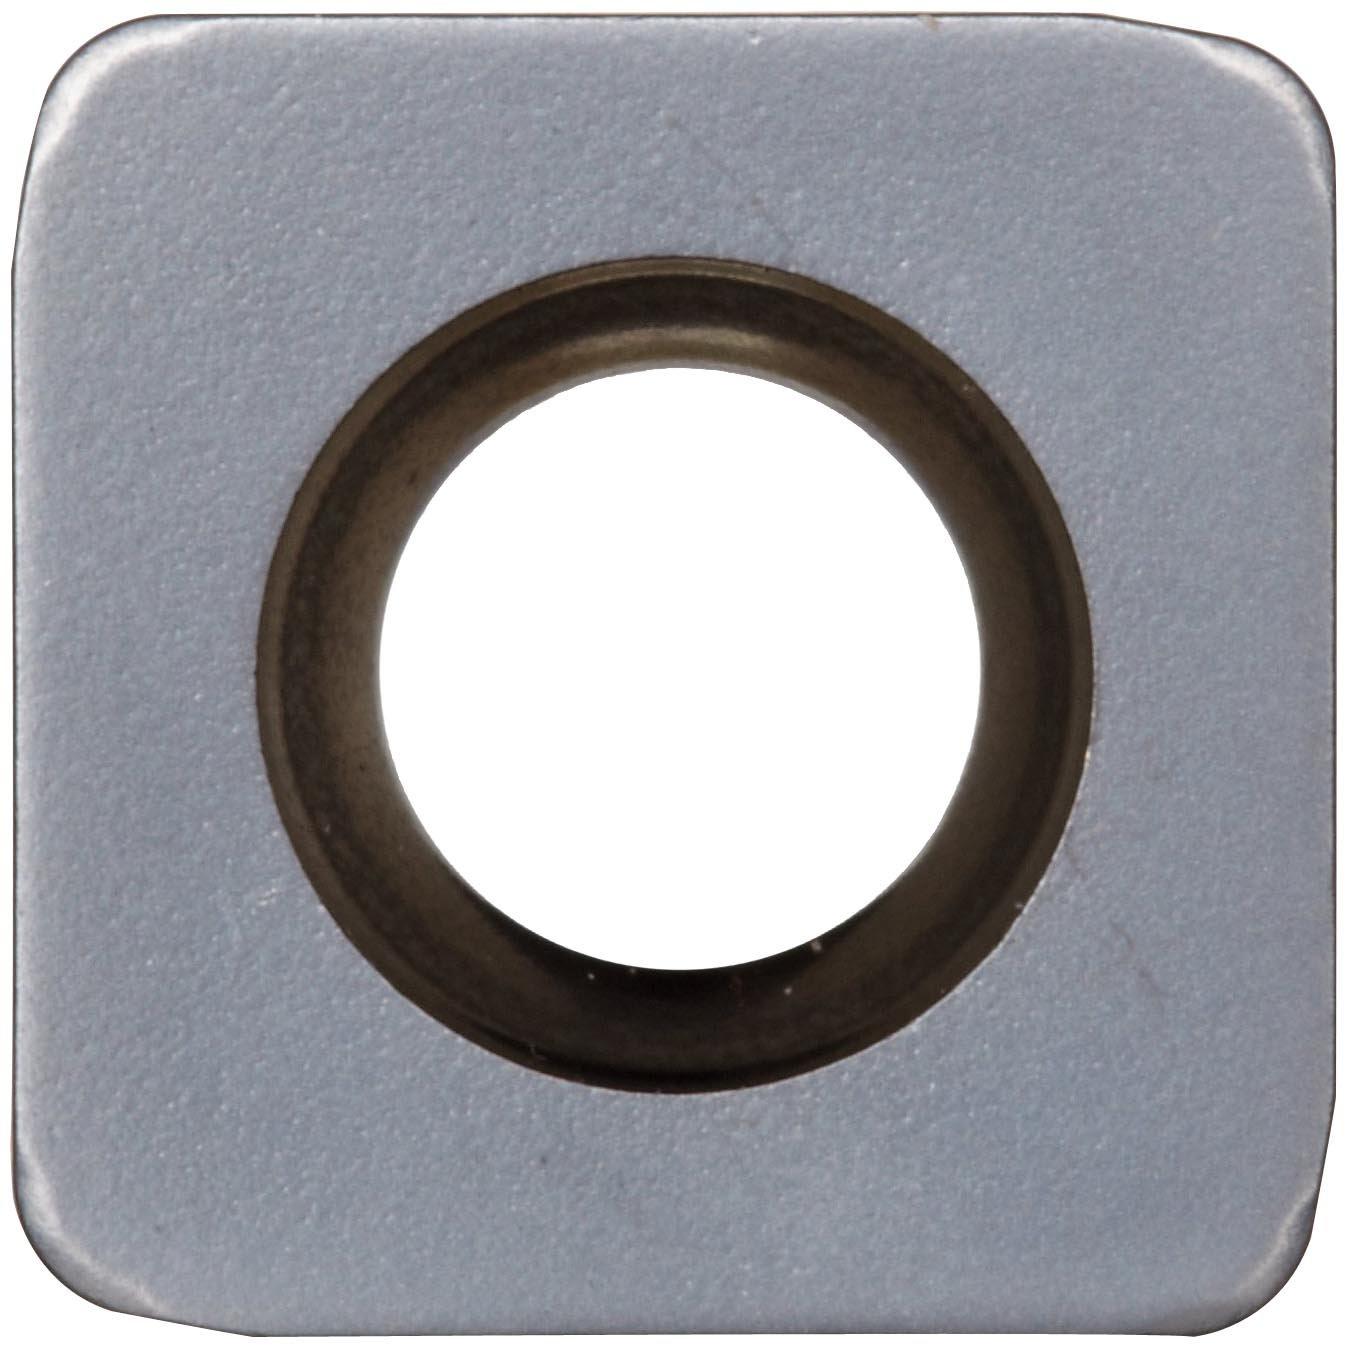 TiAlN Coating R210090414EPM,0.177 Thick Sandvik Coromant COROMILL Carbide Milling Insert 0.055 Corner Radius GC1010 Grade Square R210 Style Pack of 10